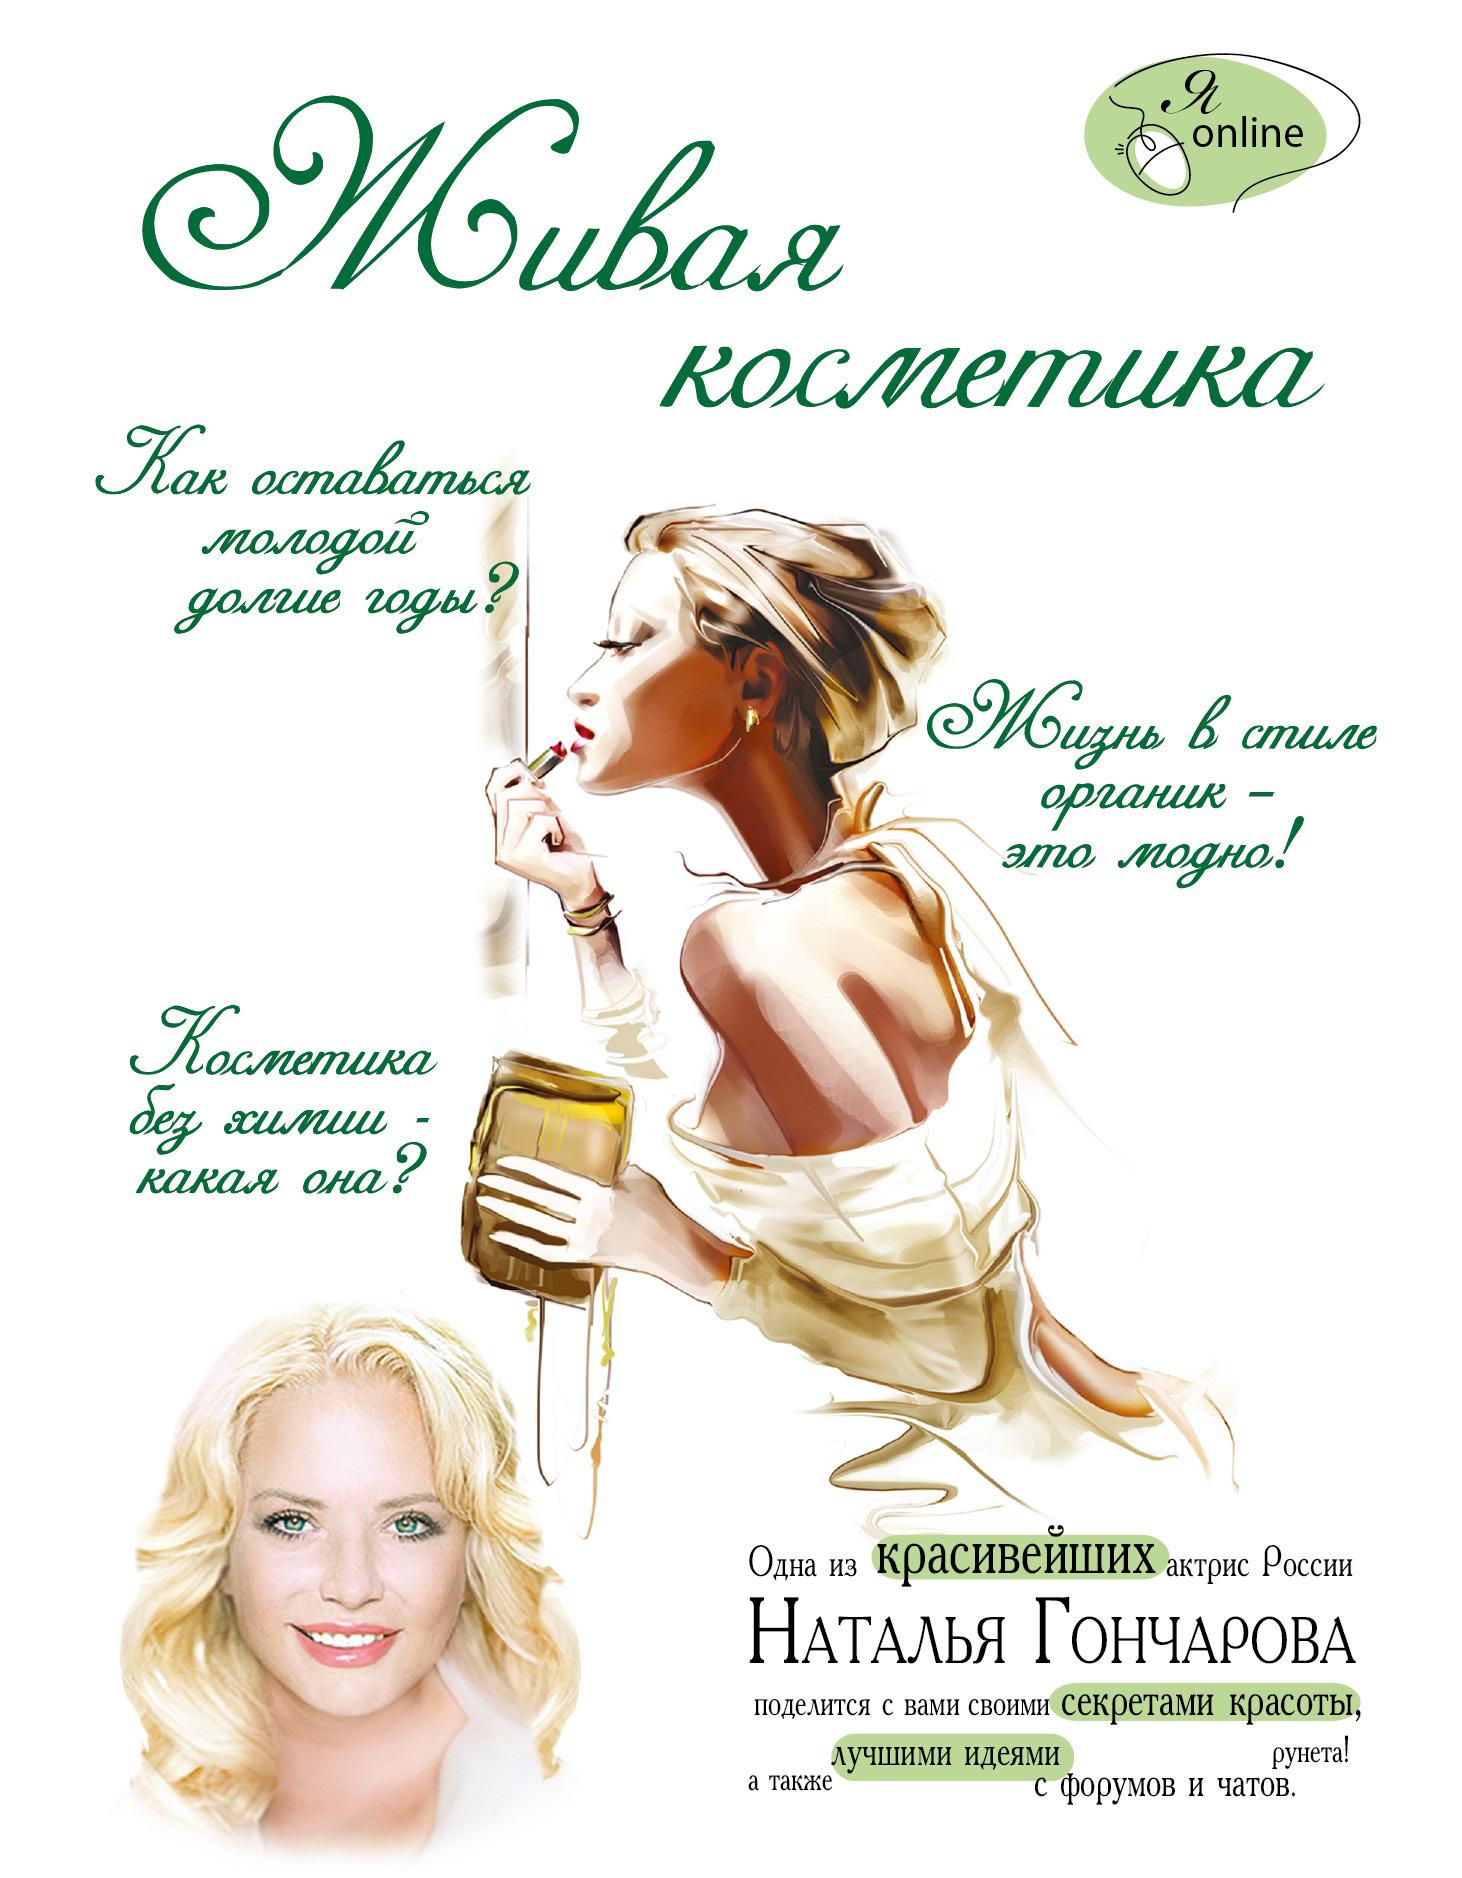 Живая косметика ( Гончарова Н.С.  )